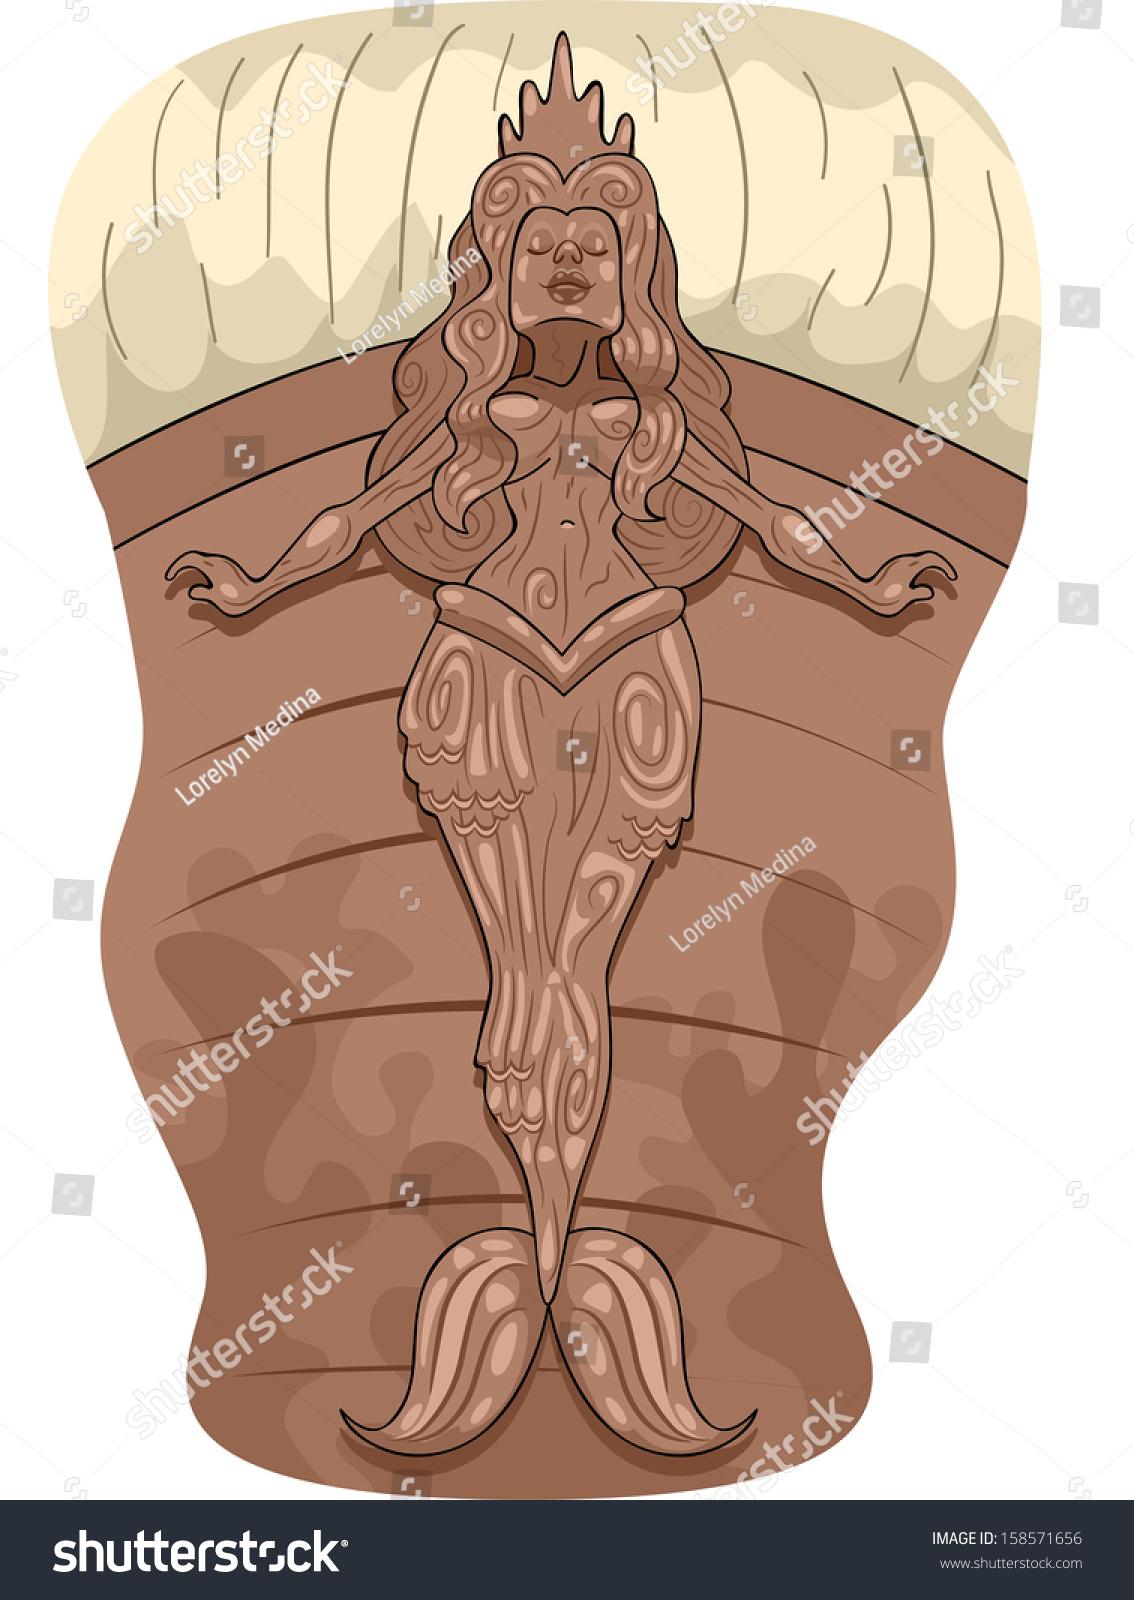 Illustration Pirate Ship Figurehead Mermaid Design Stock Vector